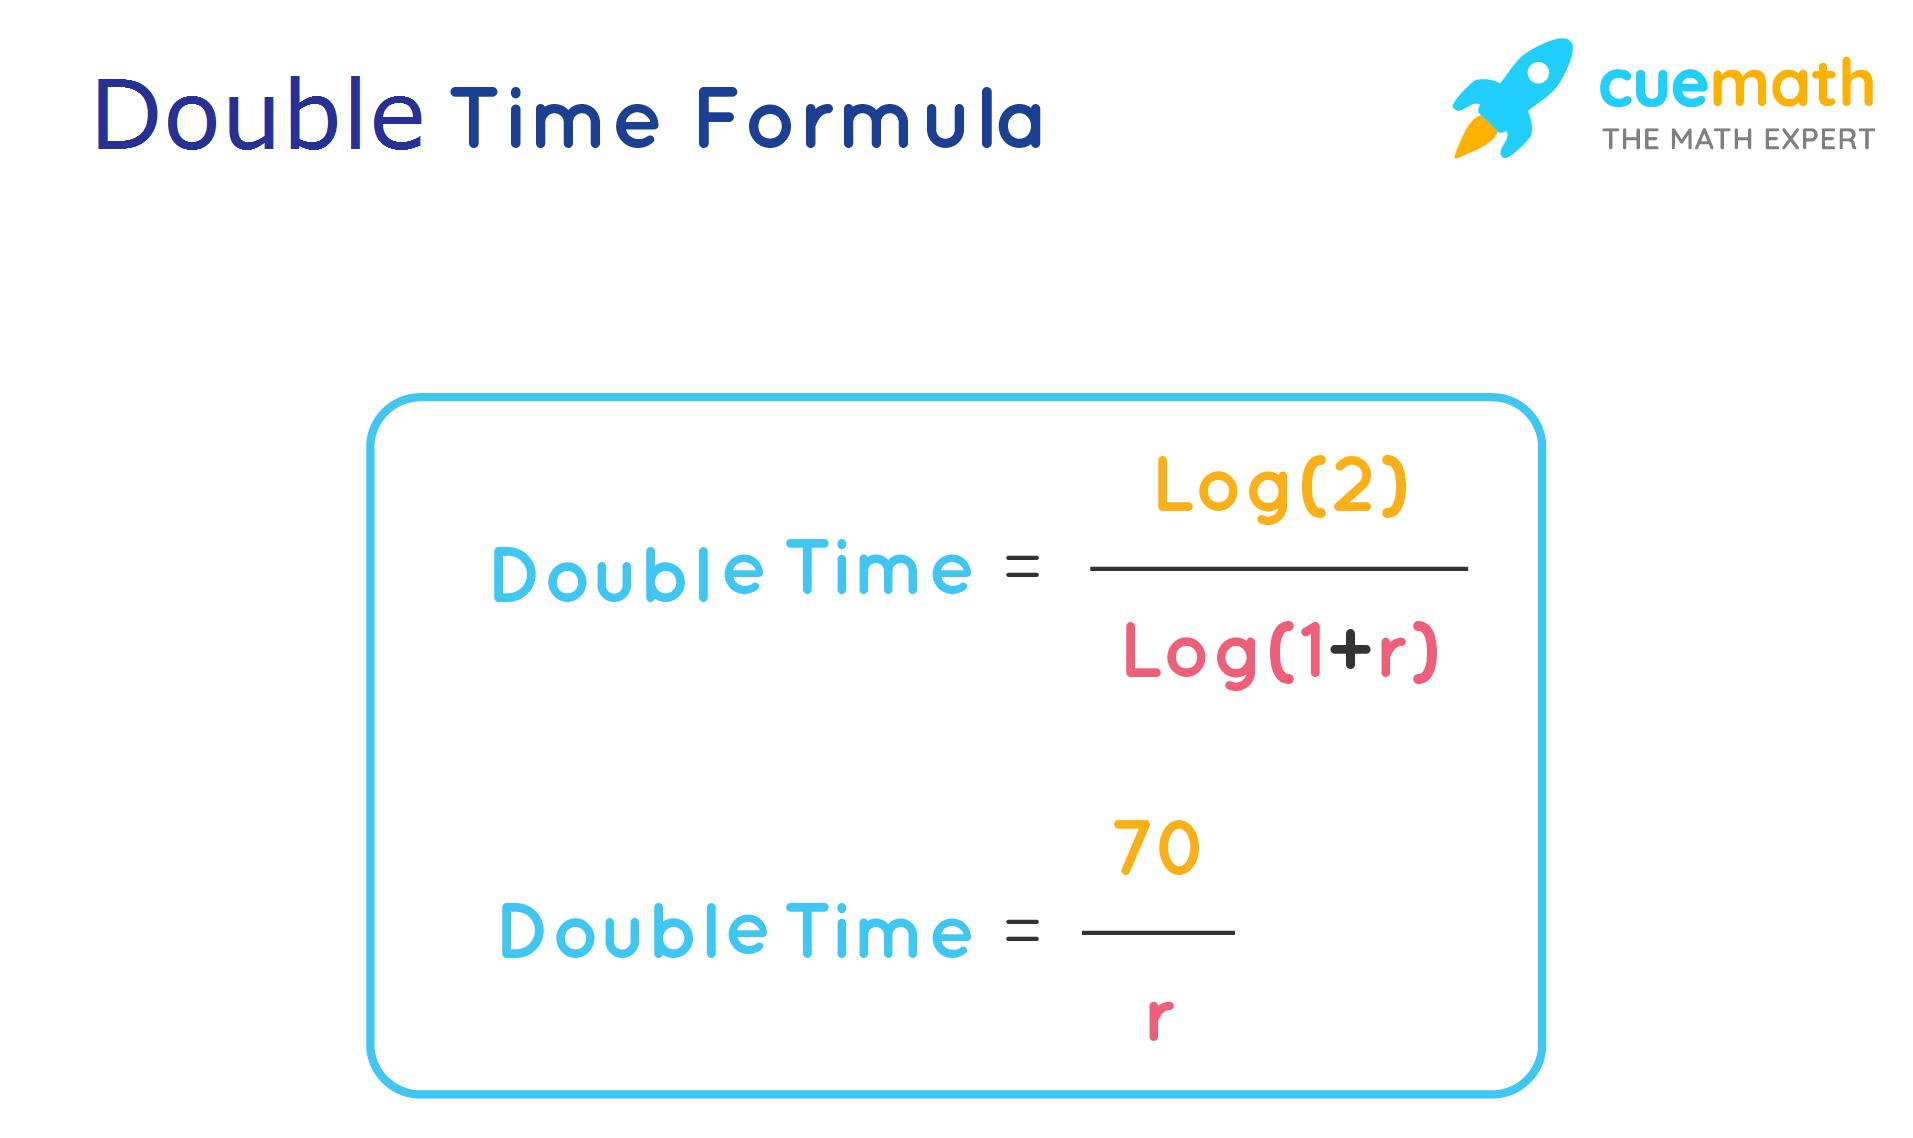 Double Time Formula